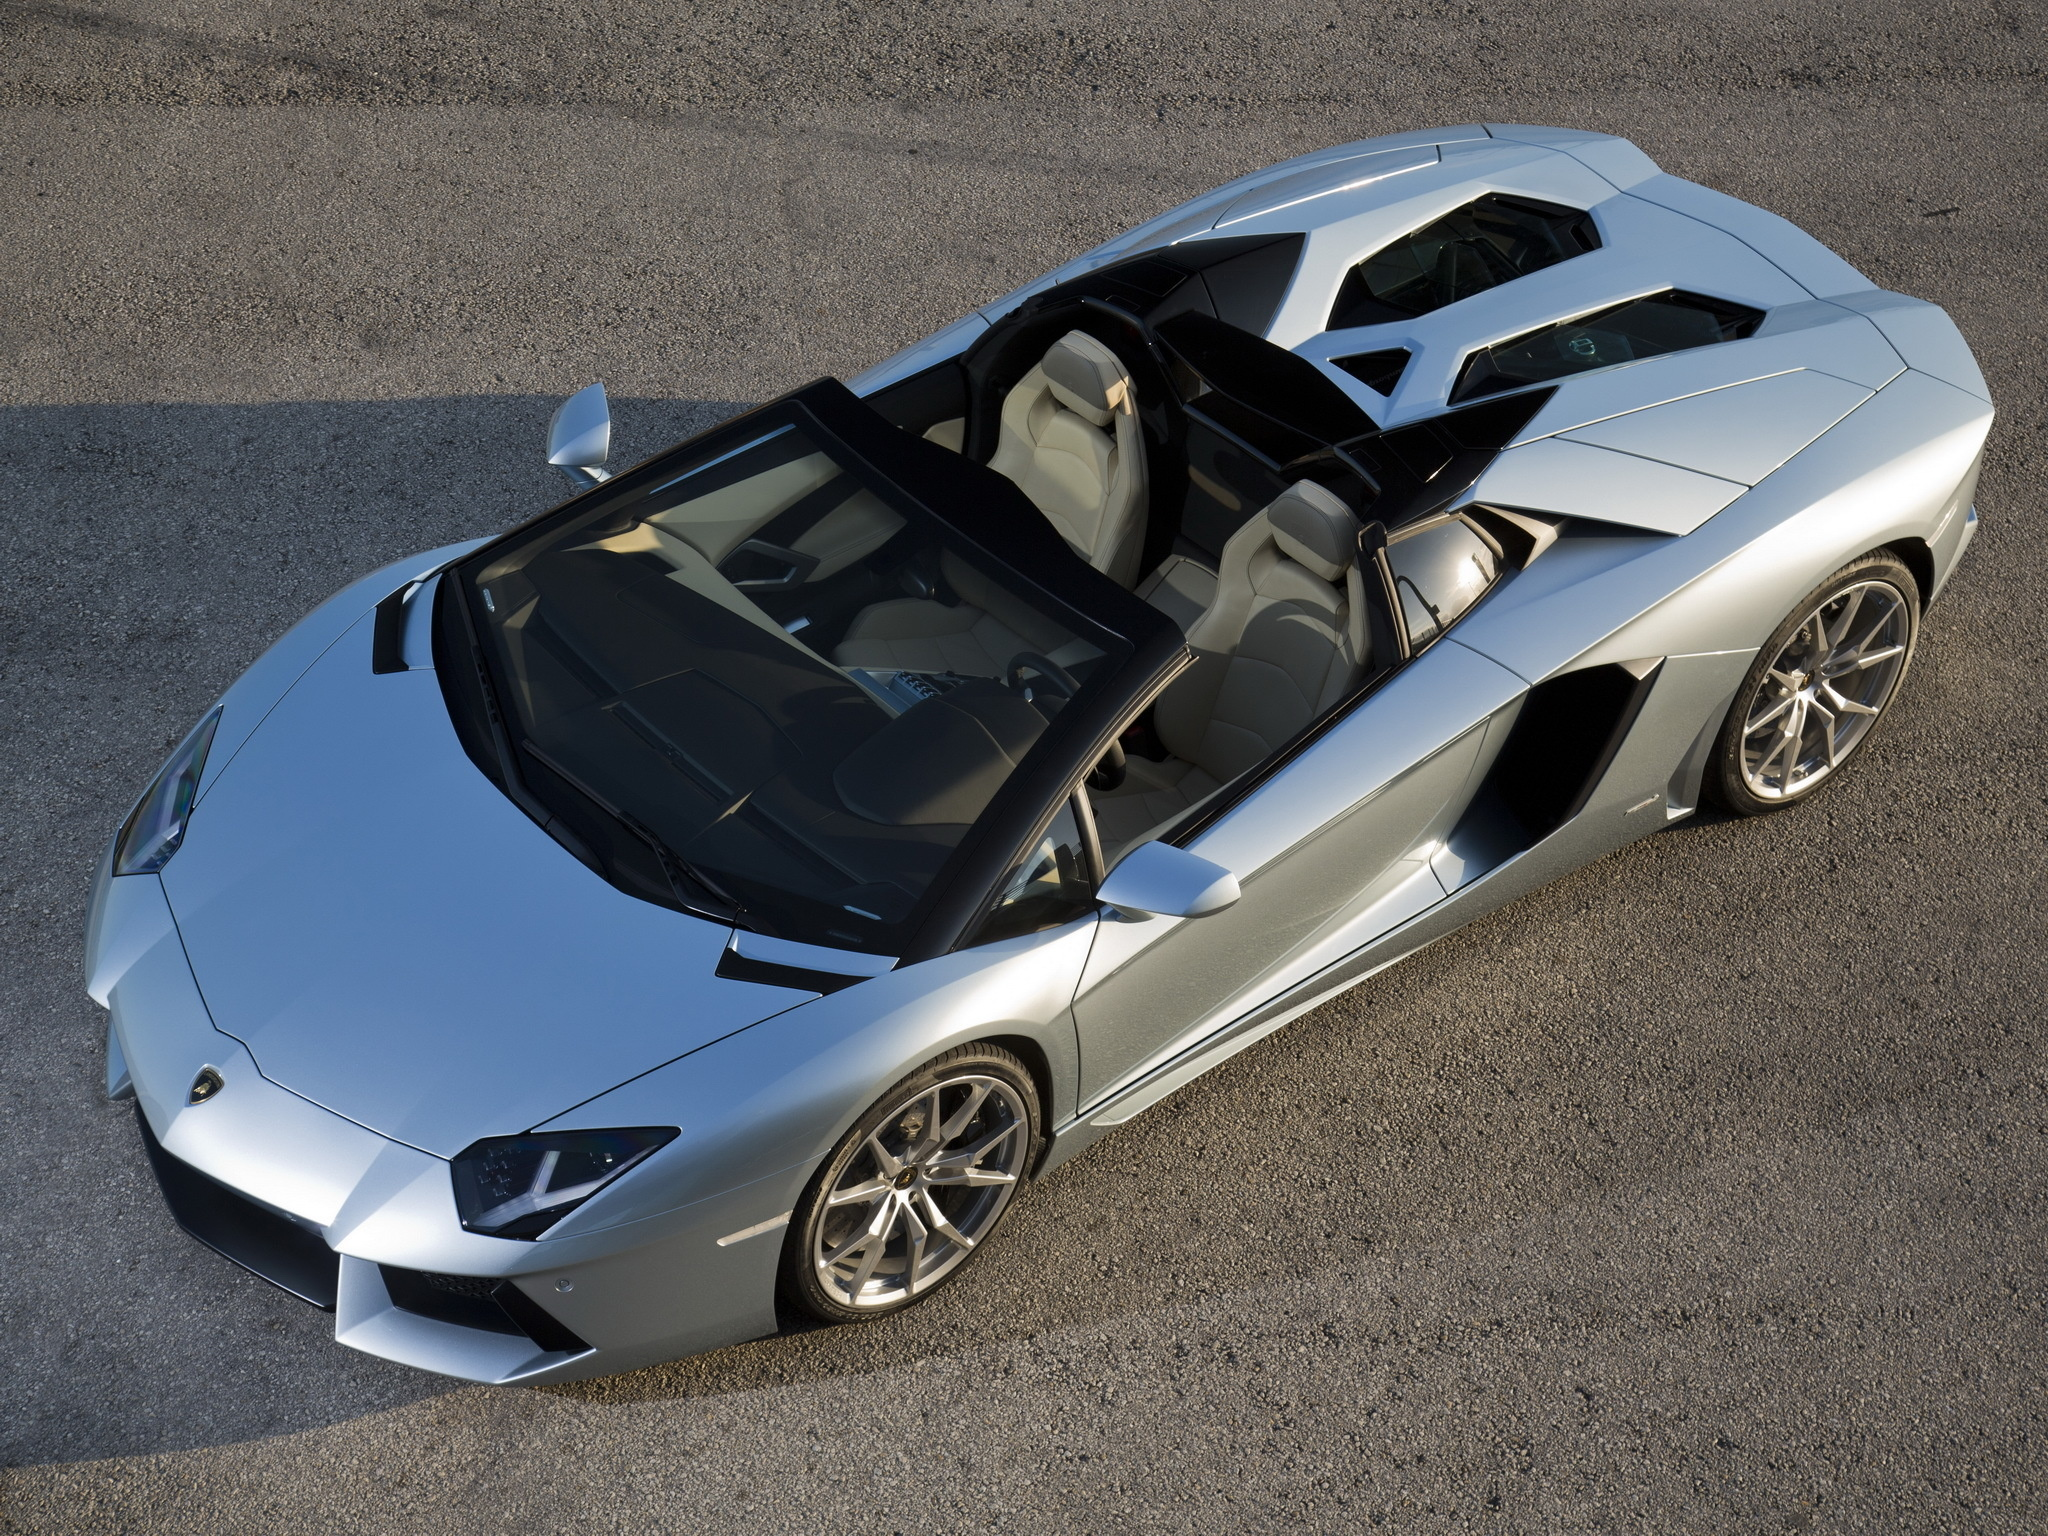 144680 descarga Gris fondos de pantalla para tu teléfono gratis, Coches, Lamborghini Aventador, Lp700-4, Vista Desde Arriba Gris imágenes y protectores de pantalla para tu teléfono